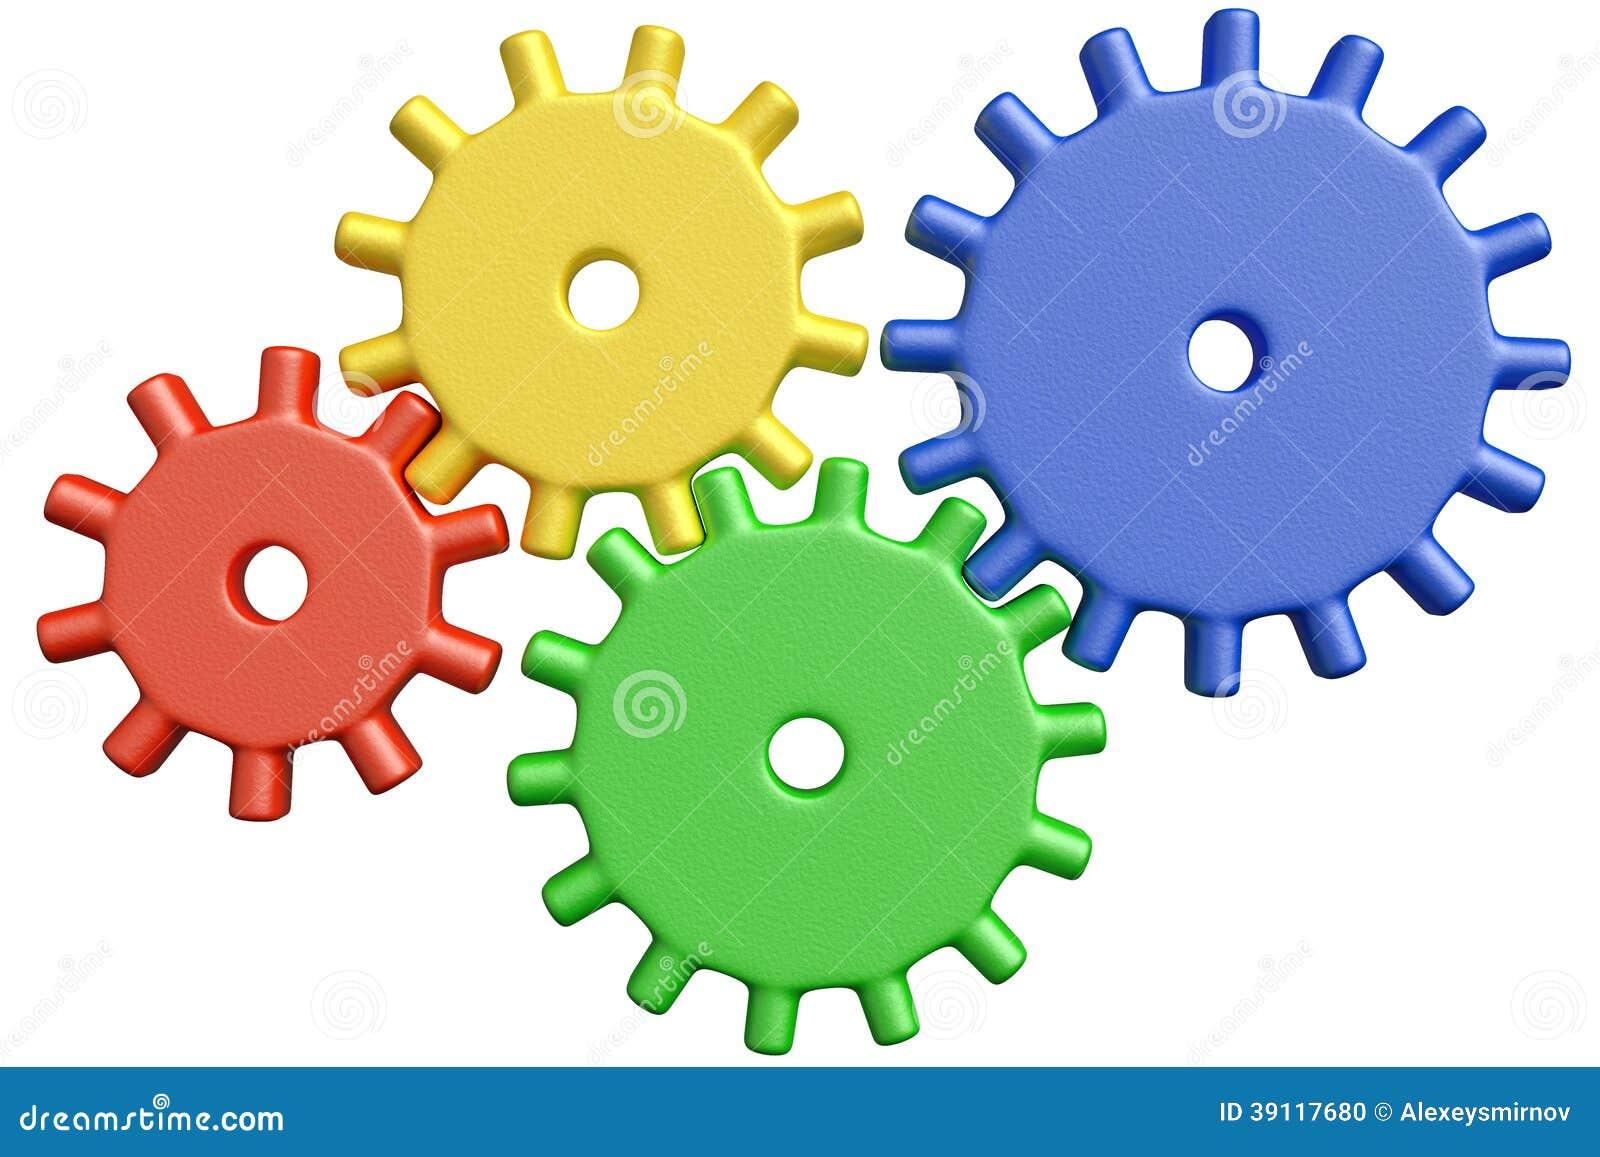 Plastic Toys Cogwheels Construction Stock Illustration ...